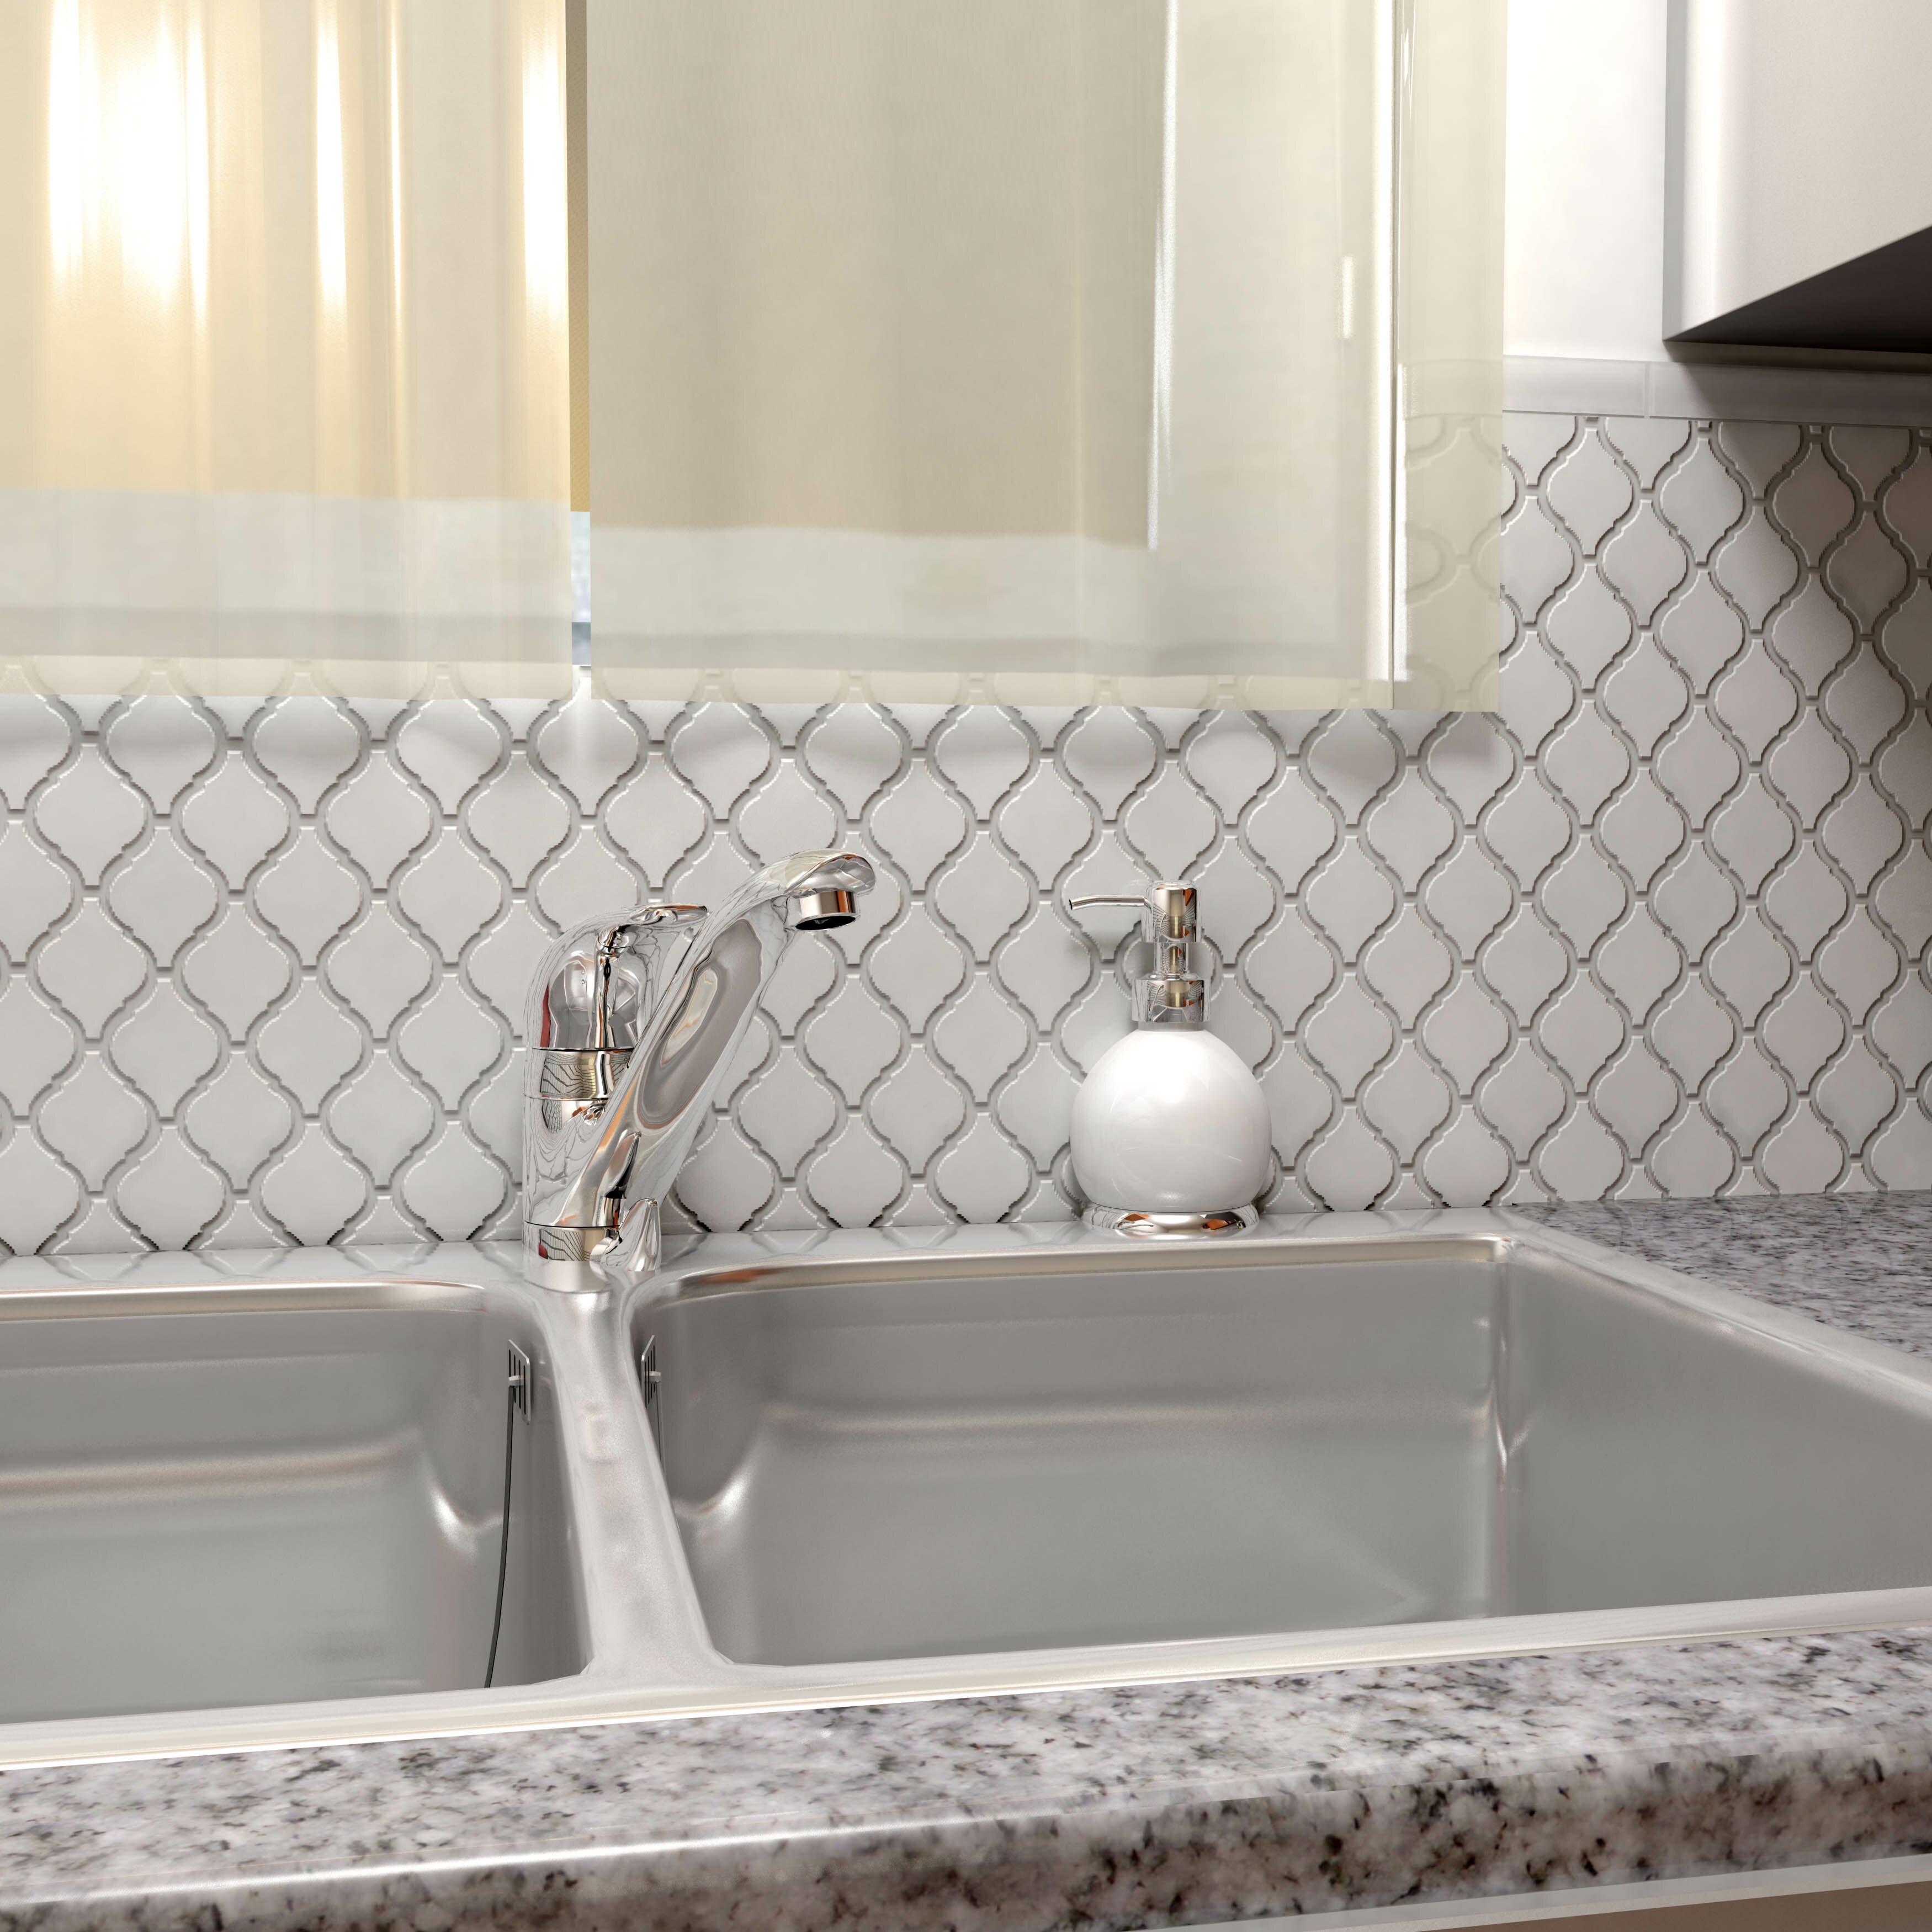 "Ceramic Tile Kitchen Backsplash: Arabesque 2-3/4"" X 1-7/8"" Porcelain Glazed Mosaic In"